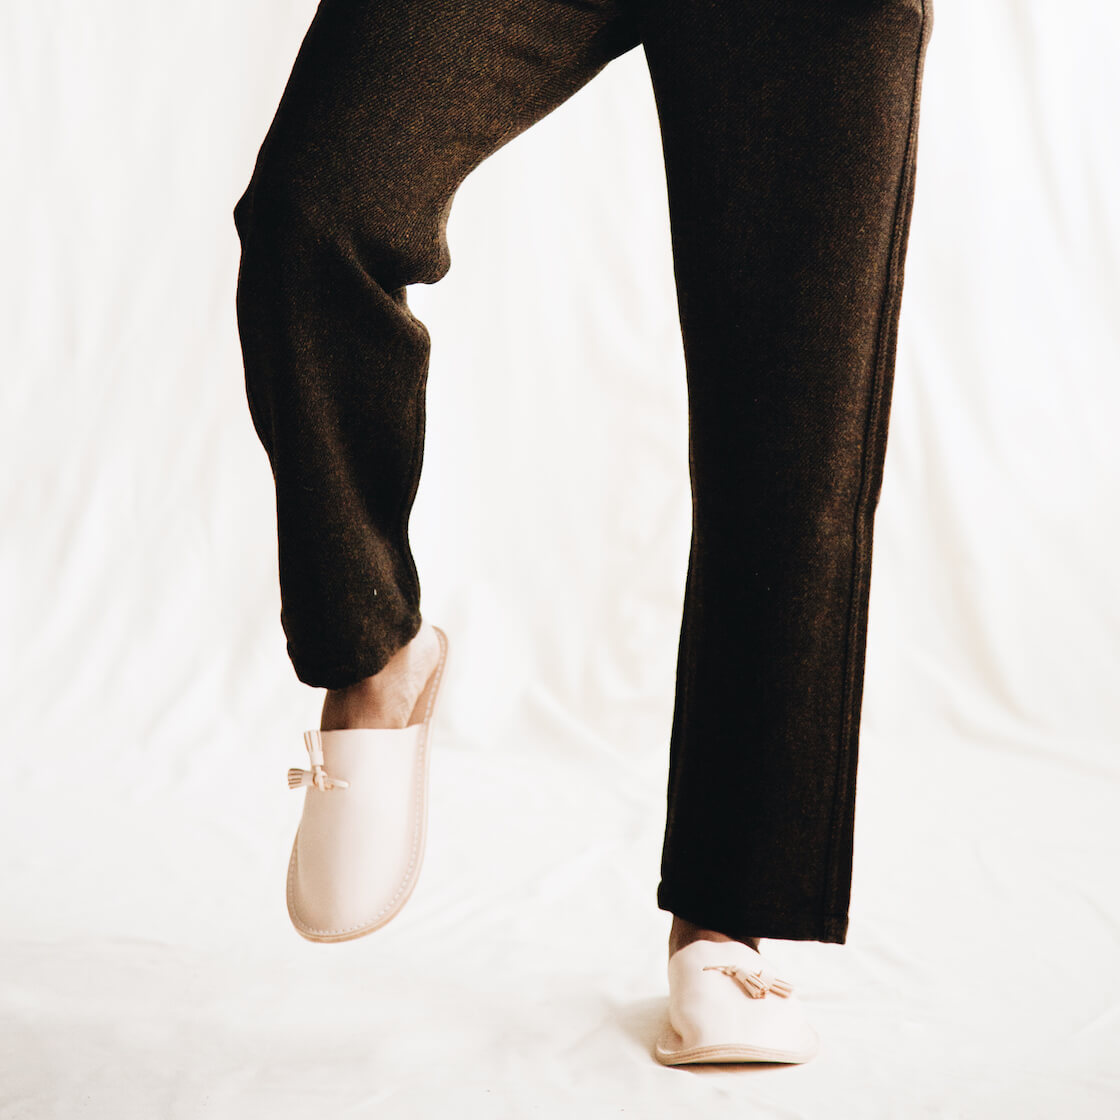 hender scheme leather slippers on body